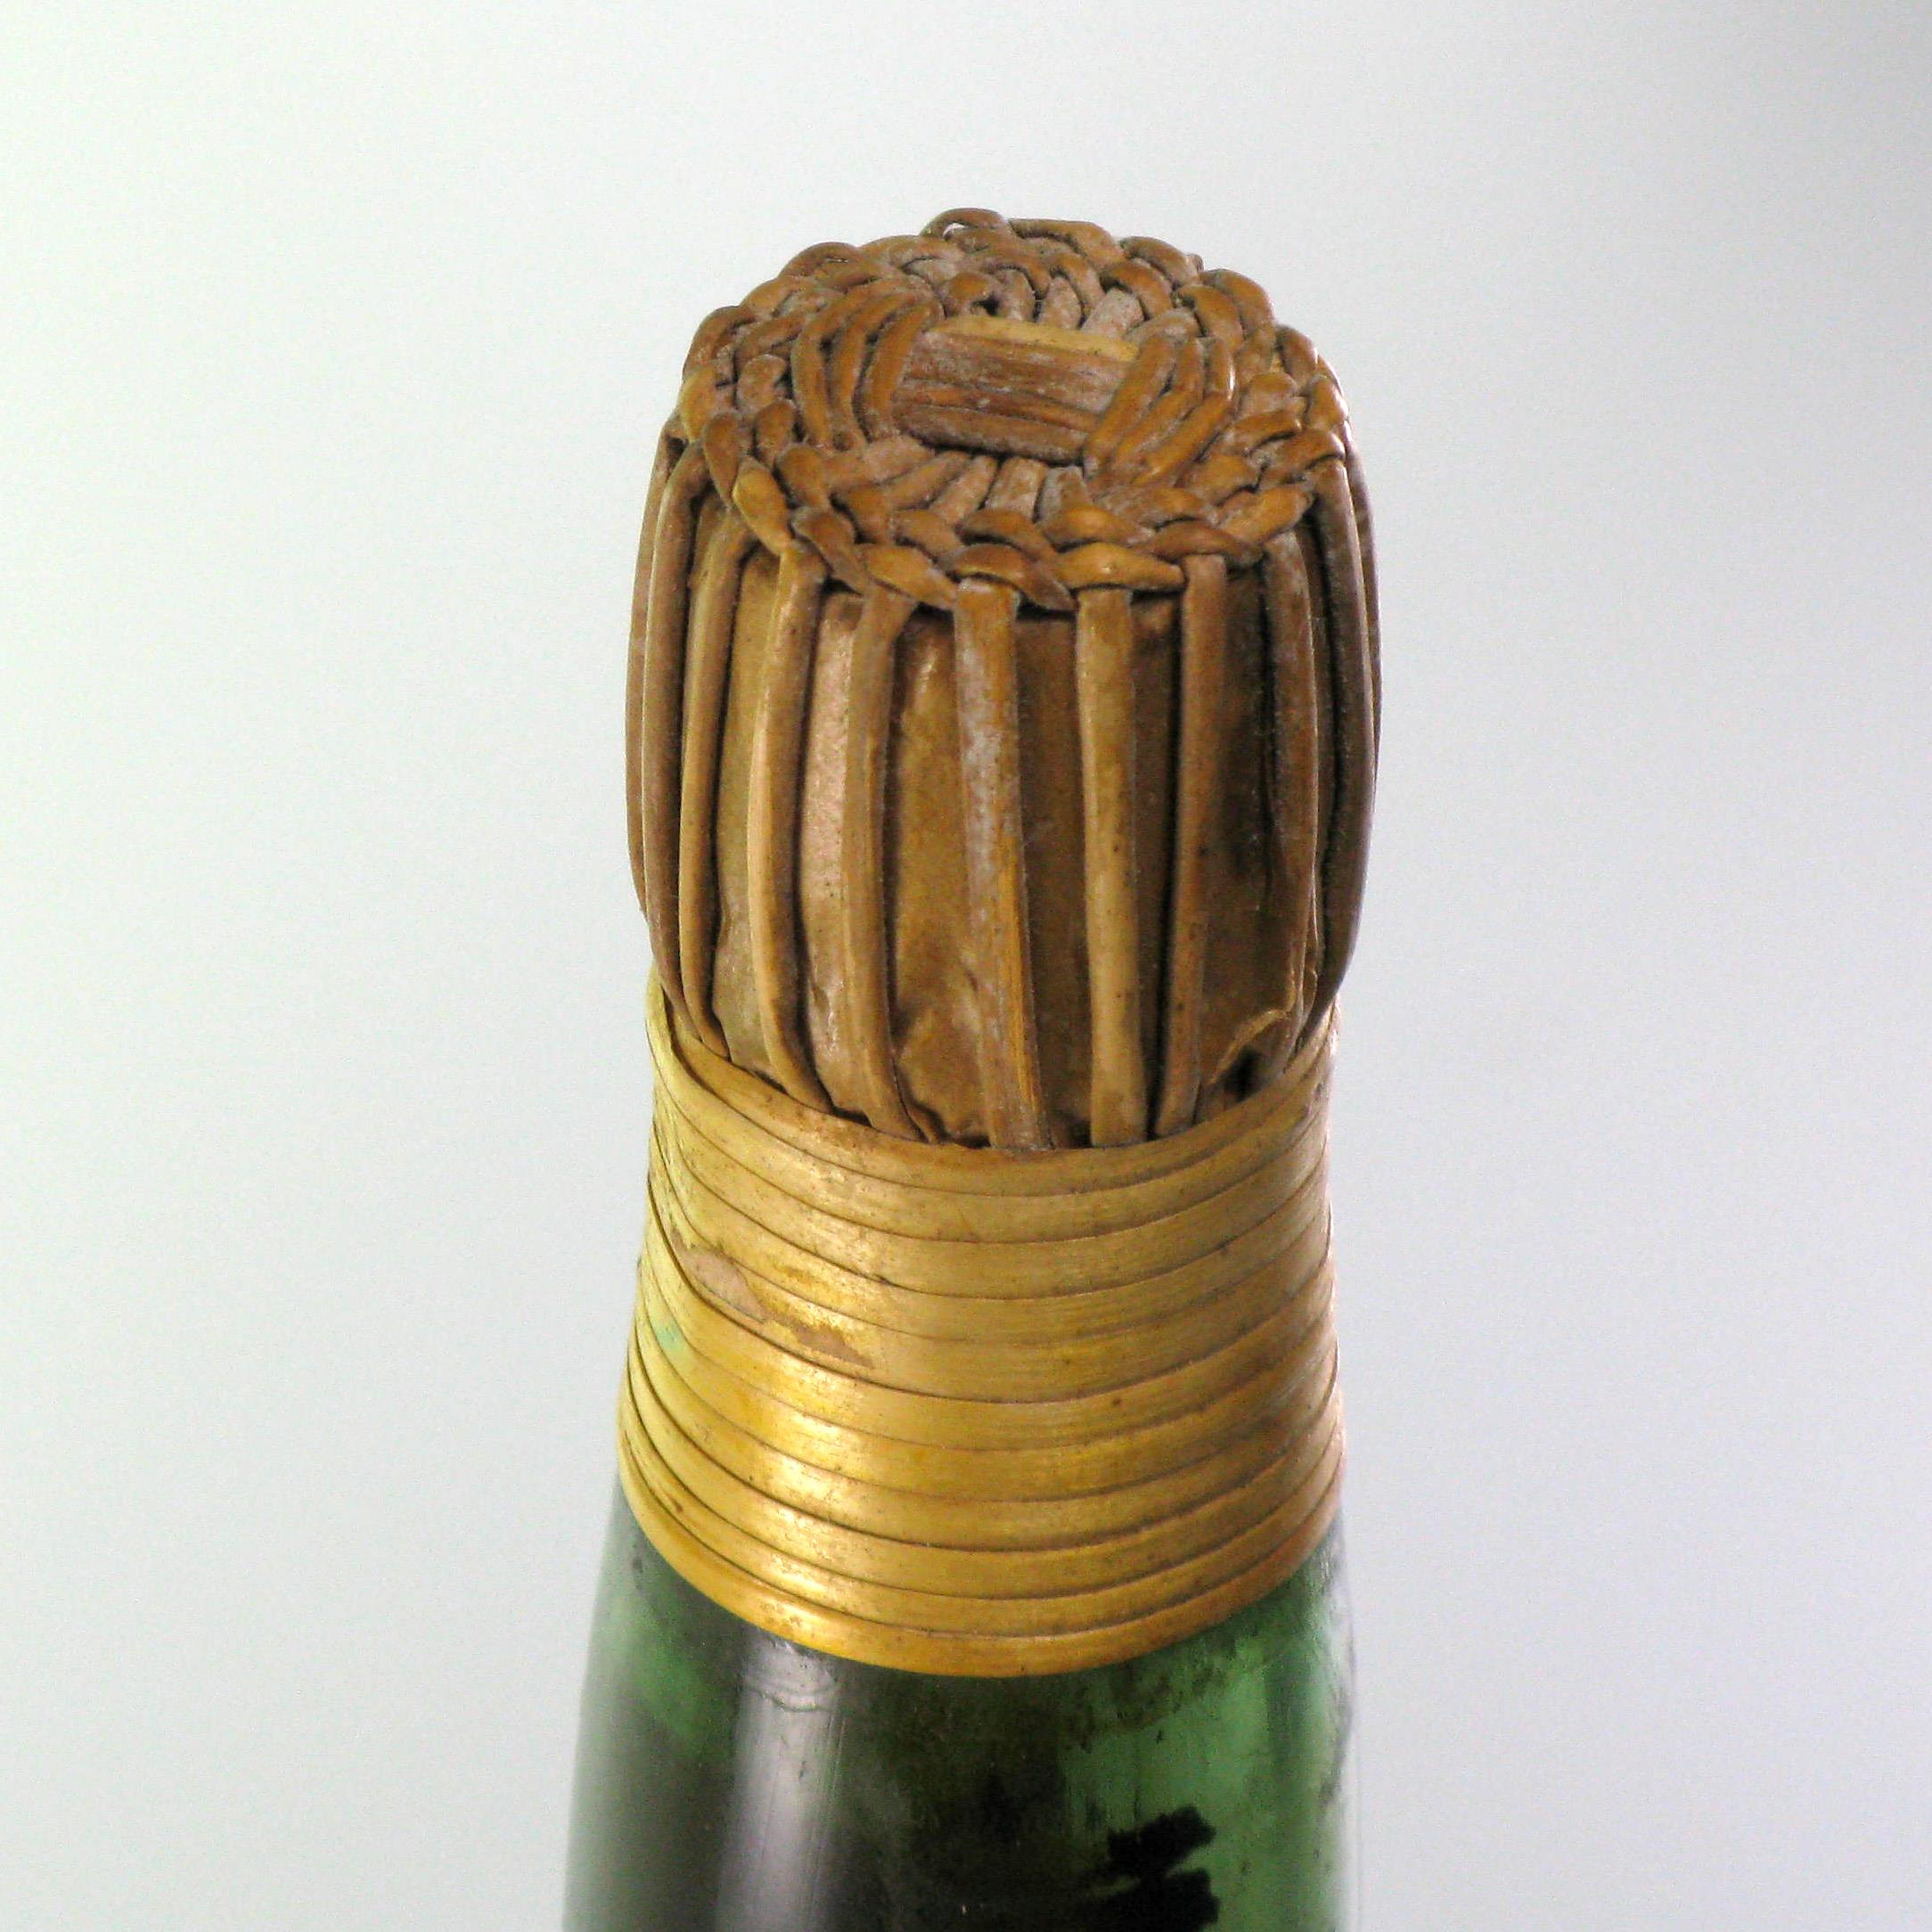 Madeira 1795 Companhia Vinicola Terrantez